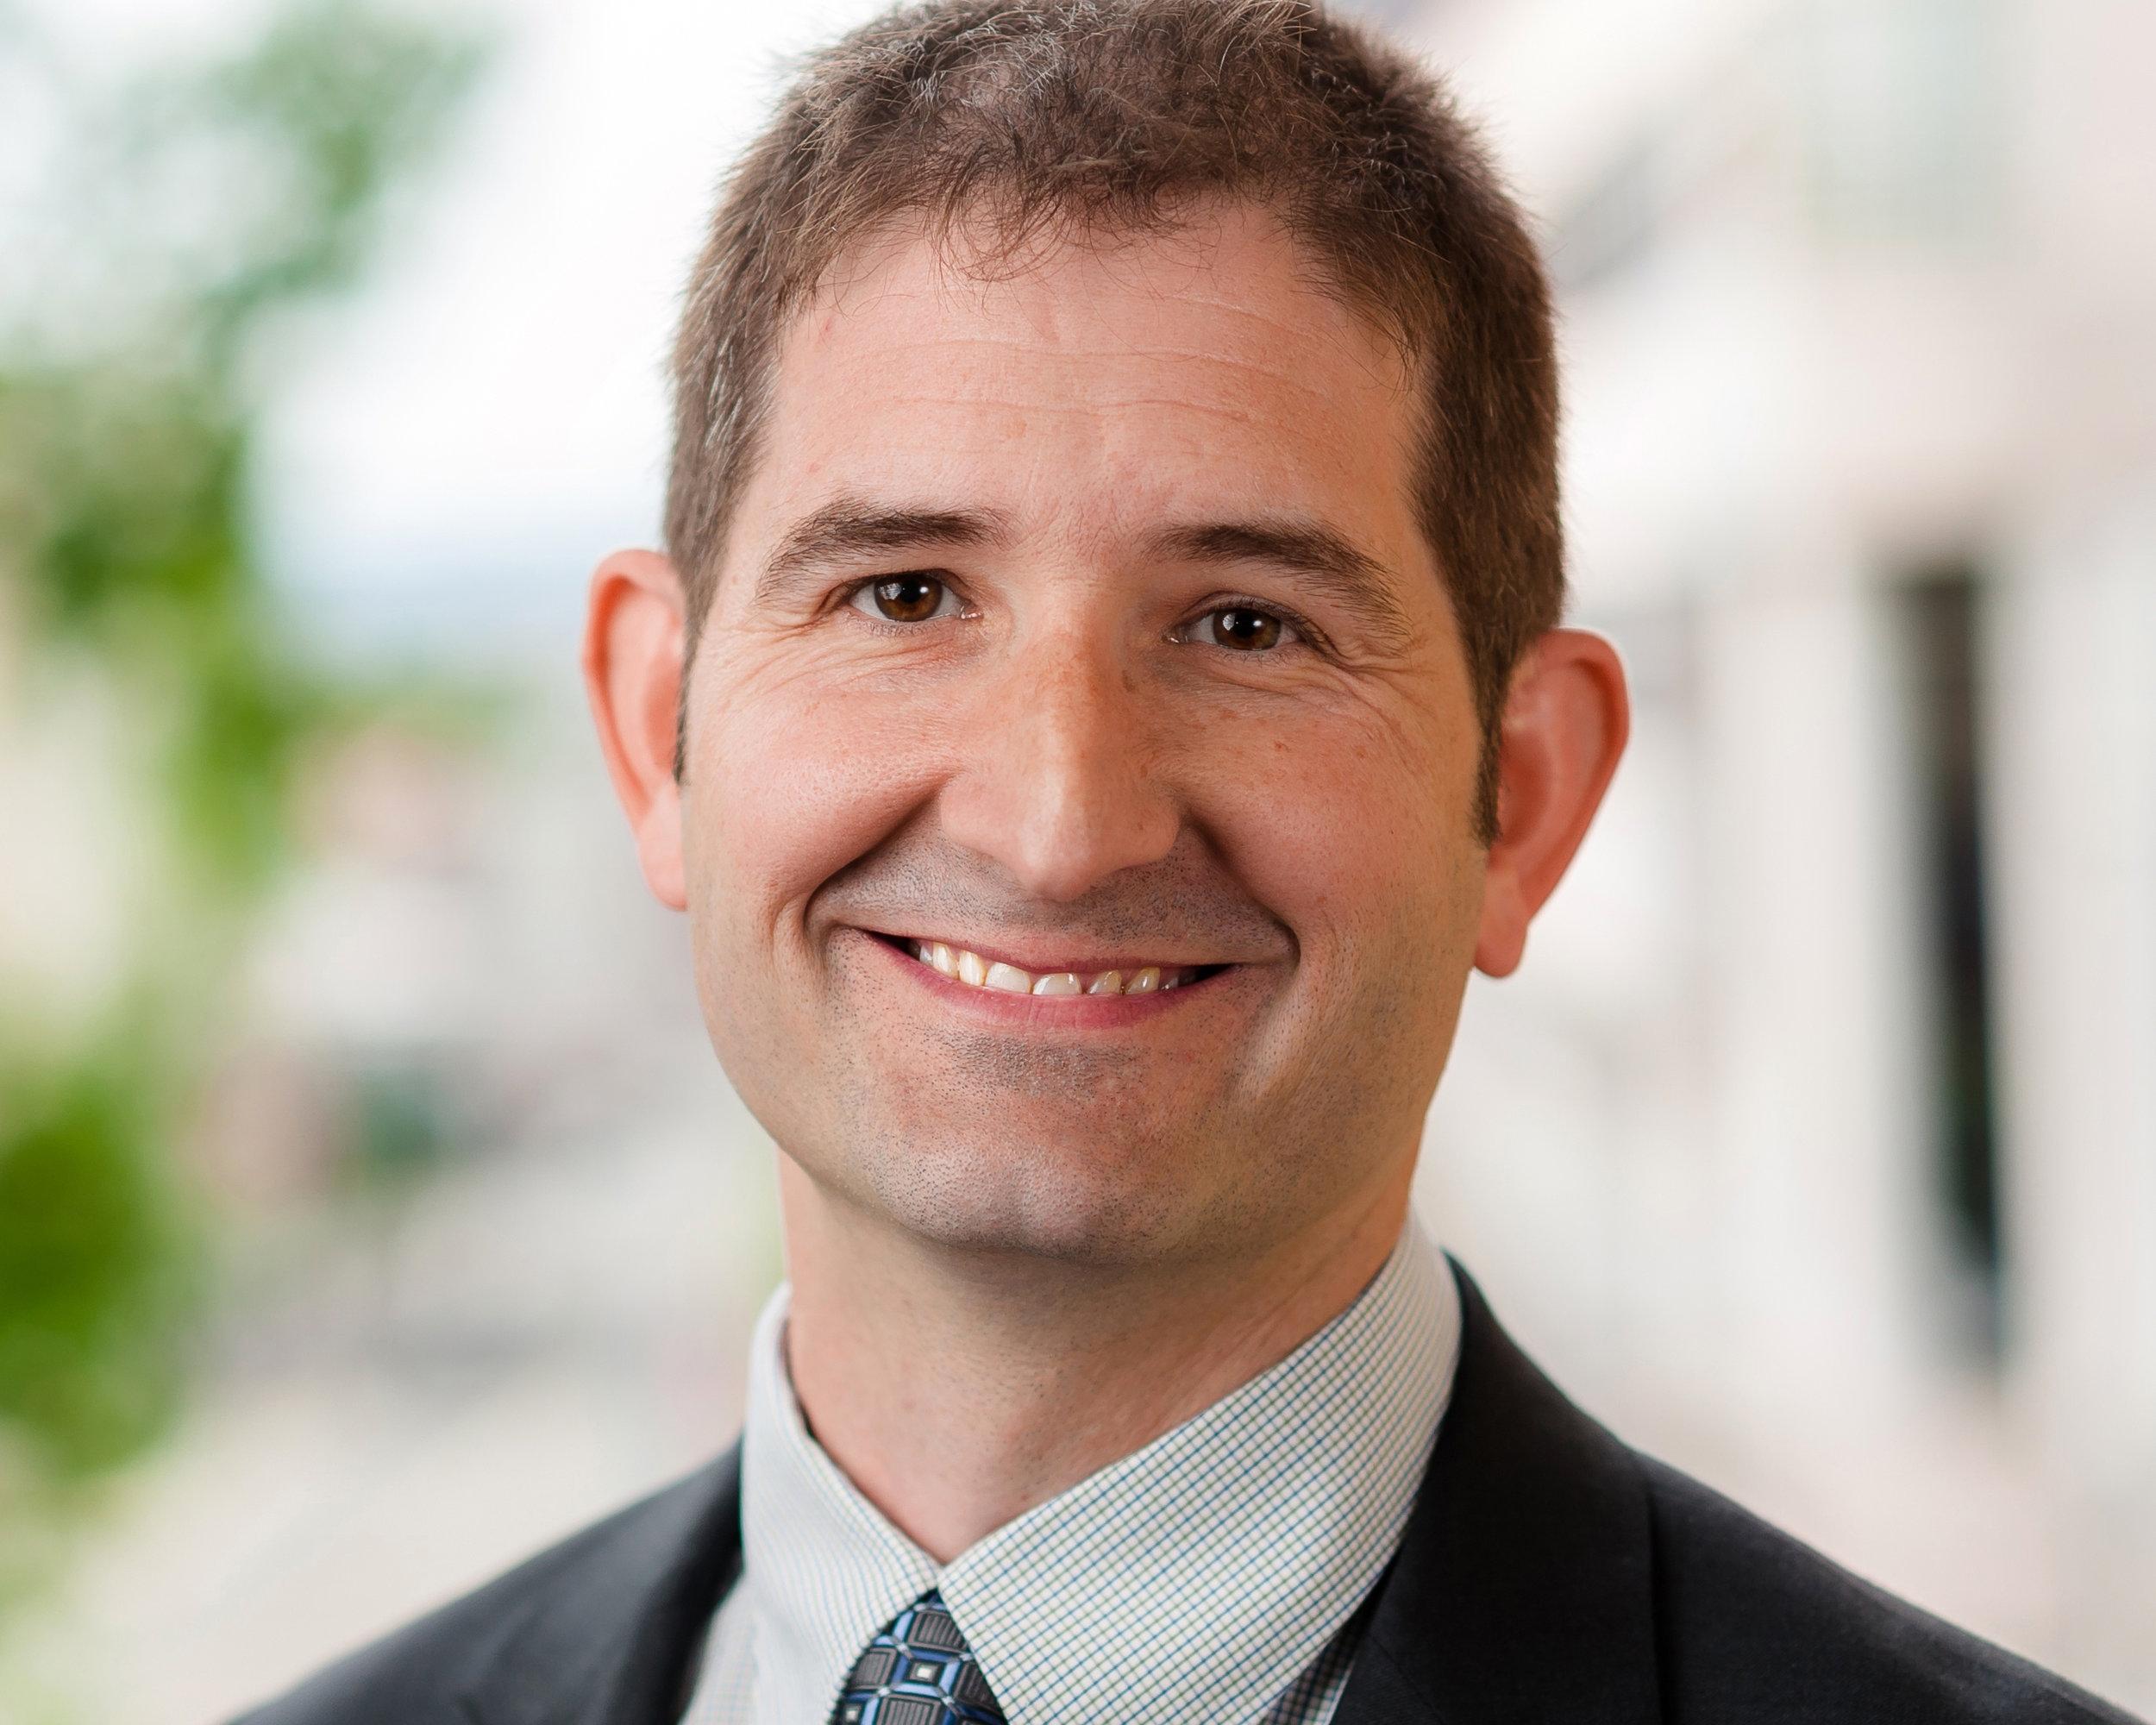 Iain Barnes - Vice President